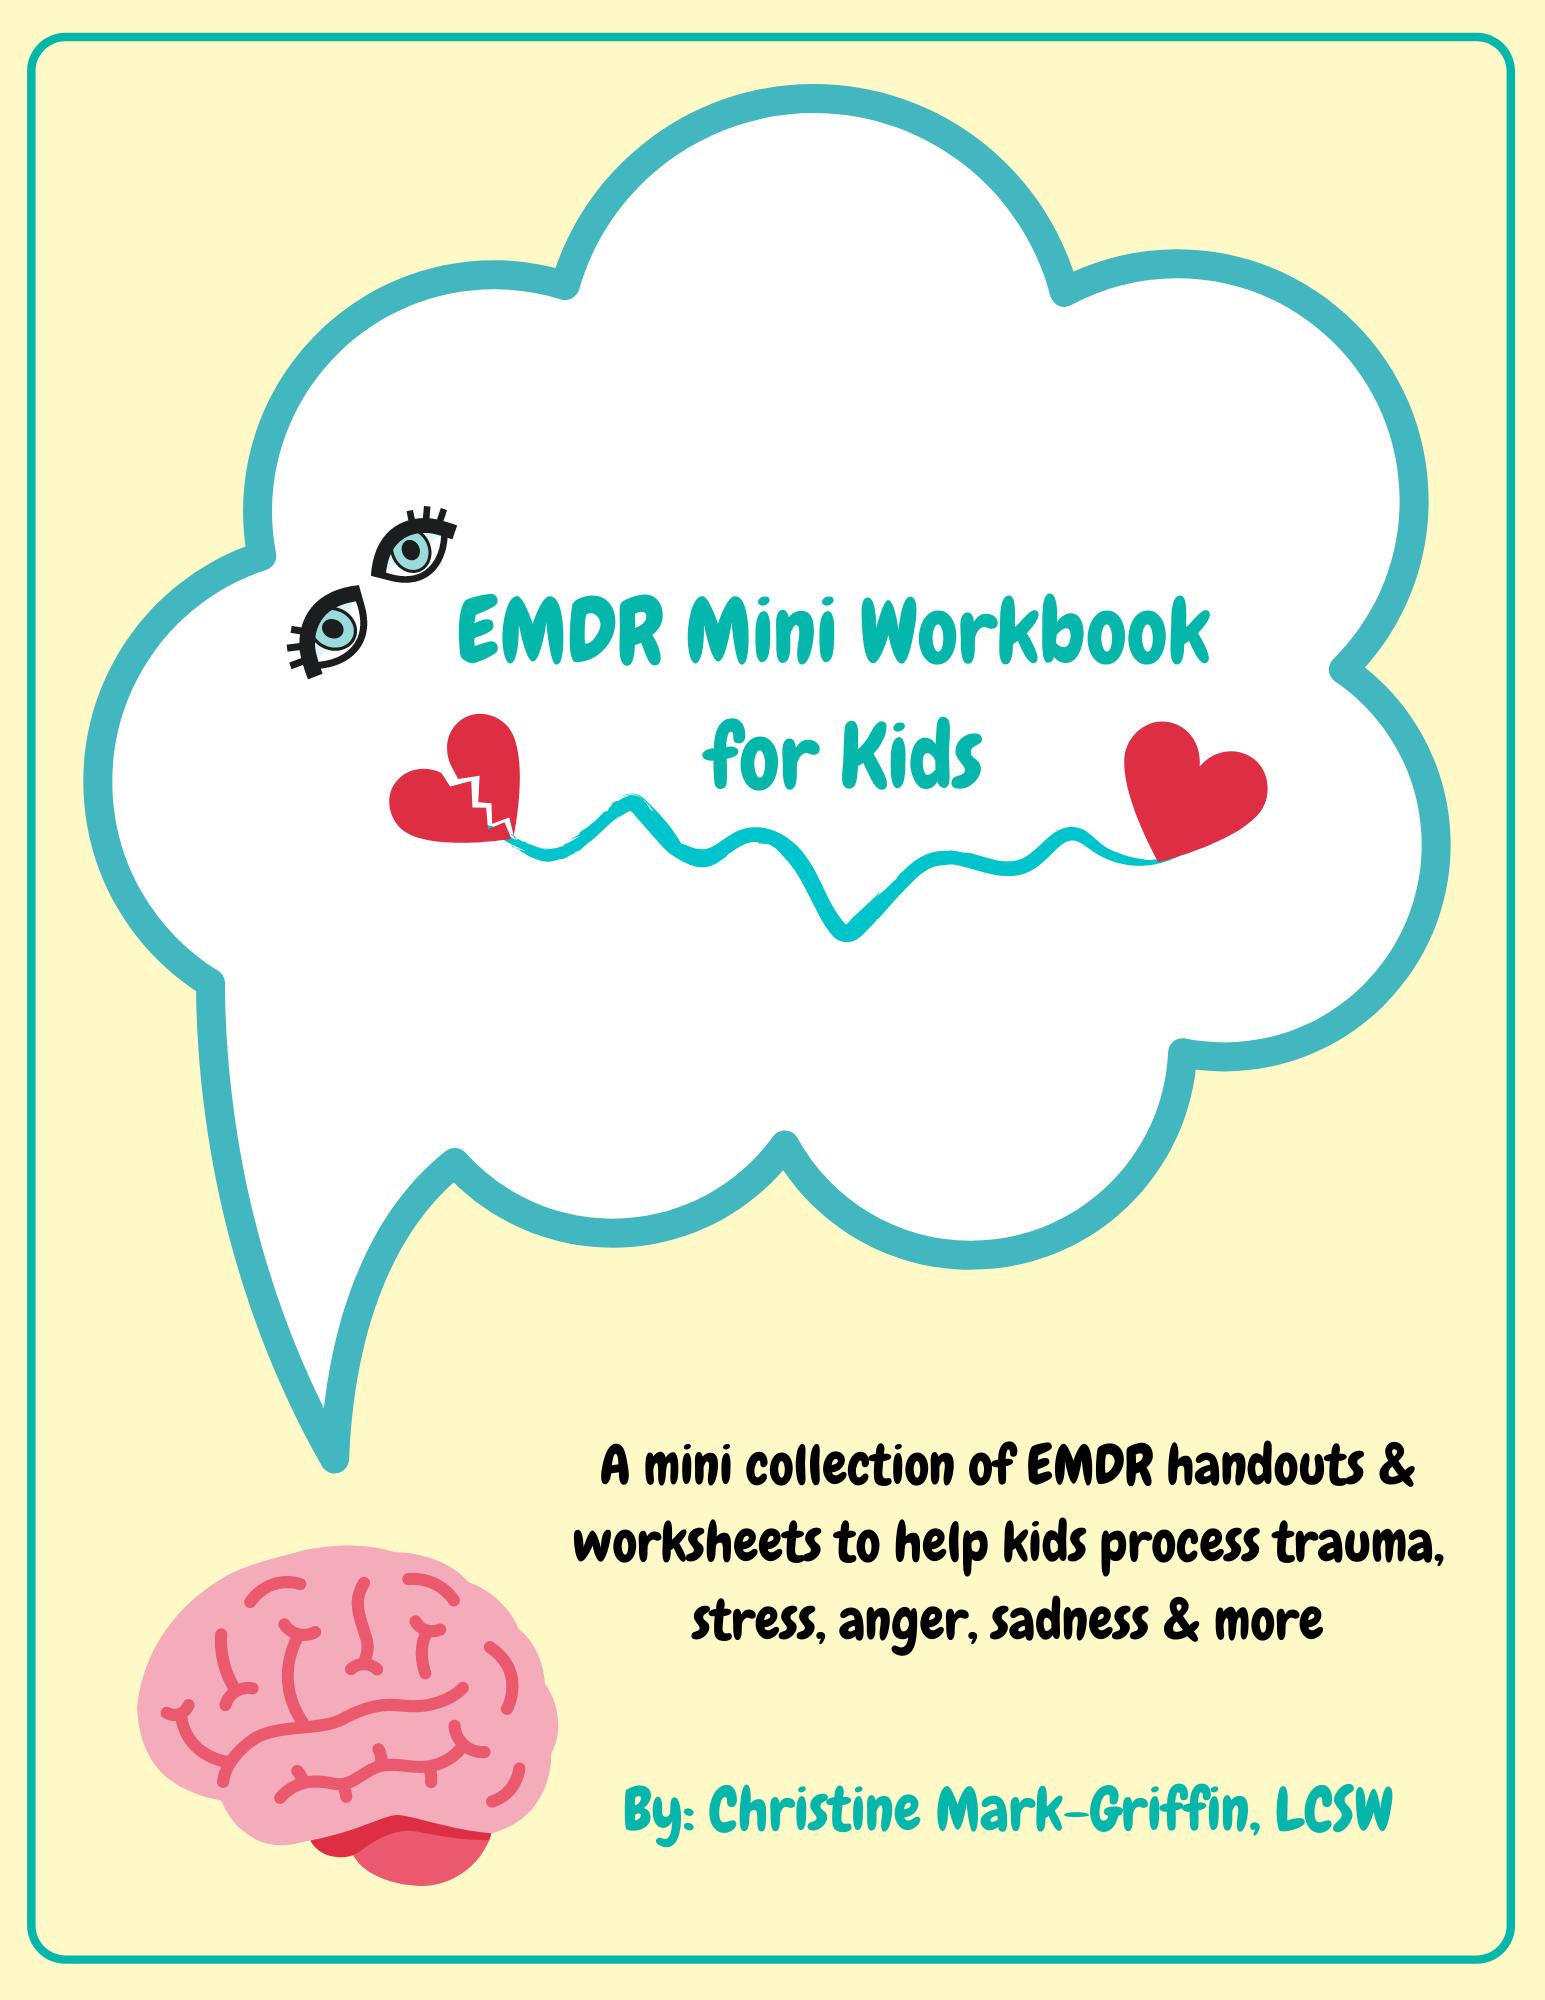 Emdr Mini Workbook For Kids In